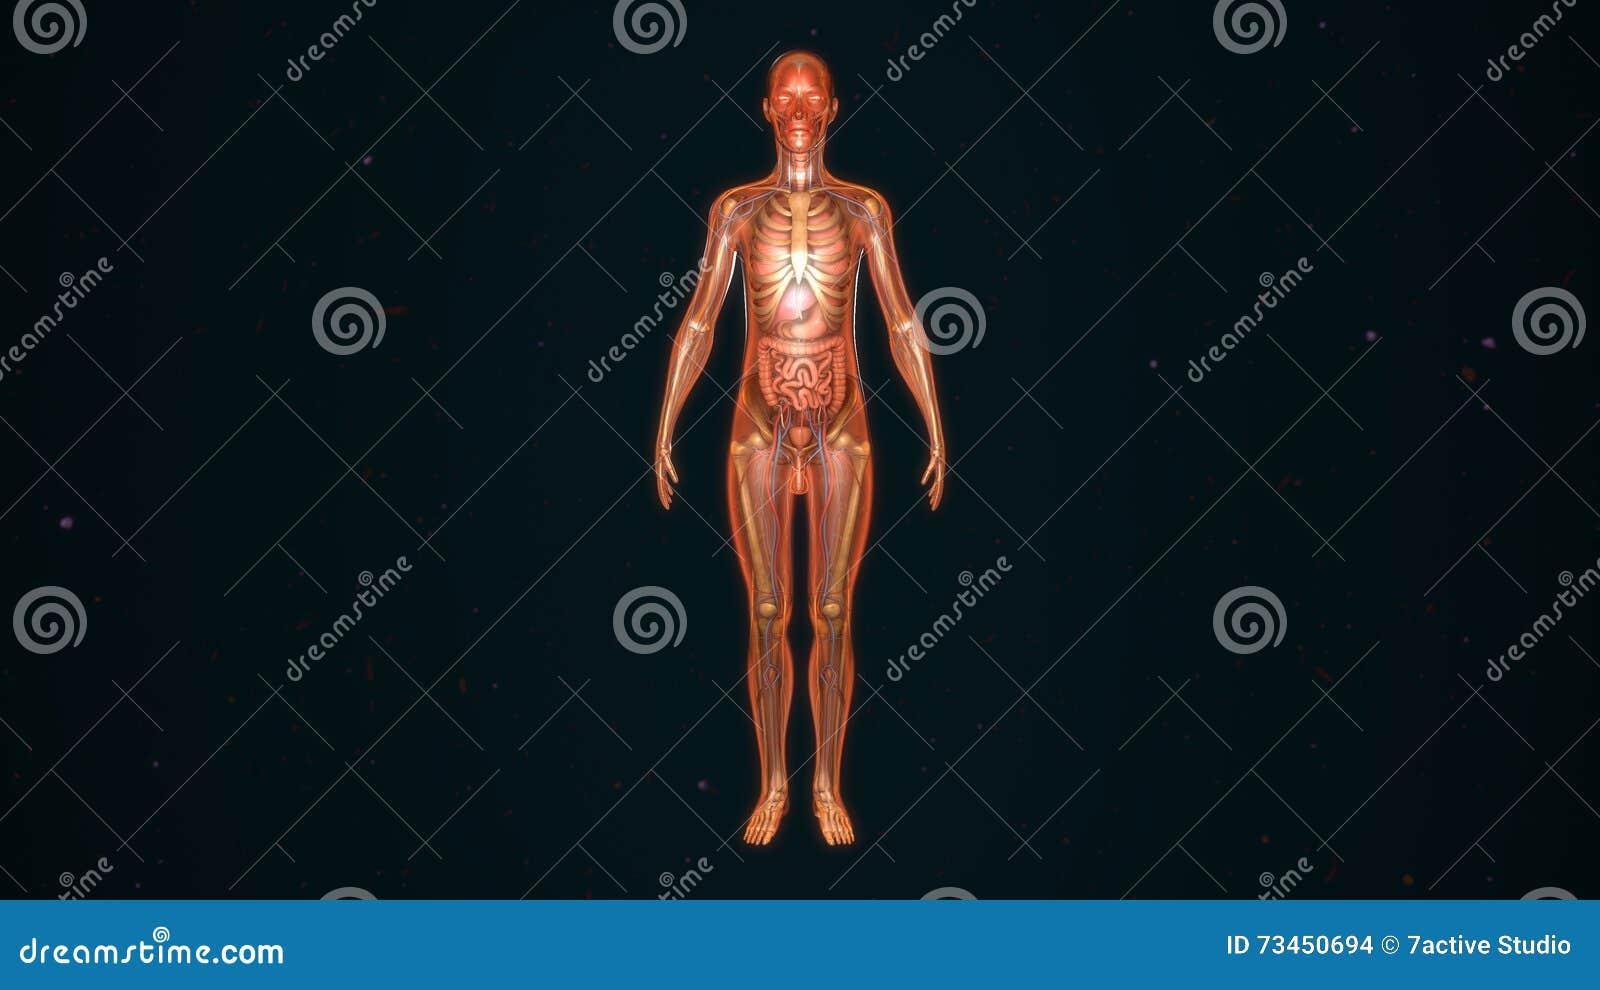 Human Anatomy stock illustration. Illustration of anatomy - 73450694